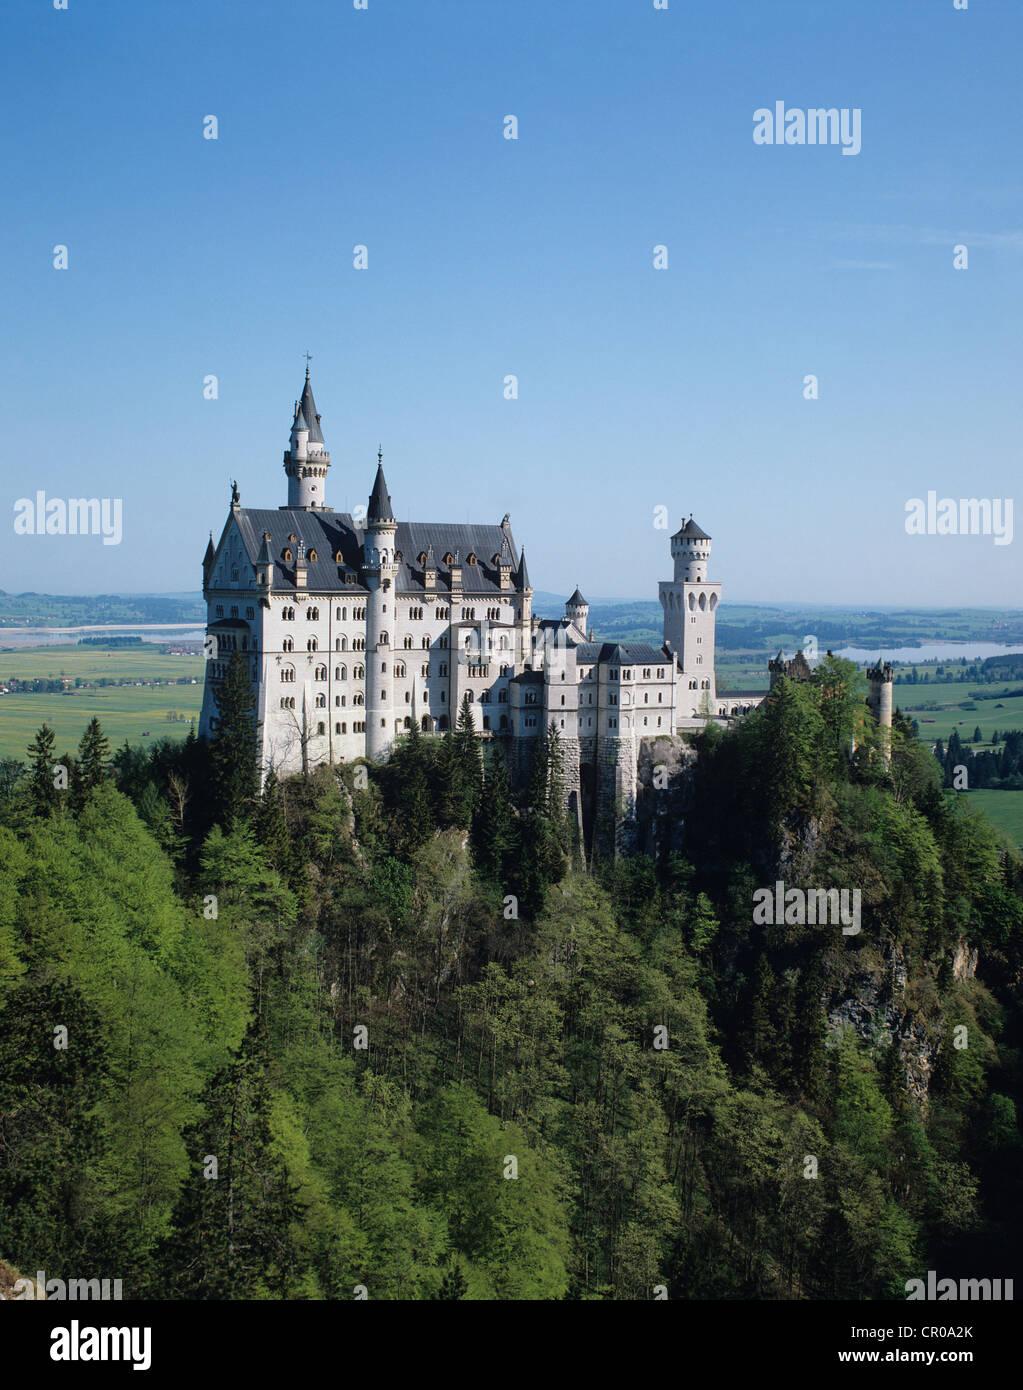 Germany. Neuschwanstein Castle. - Stock Image